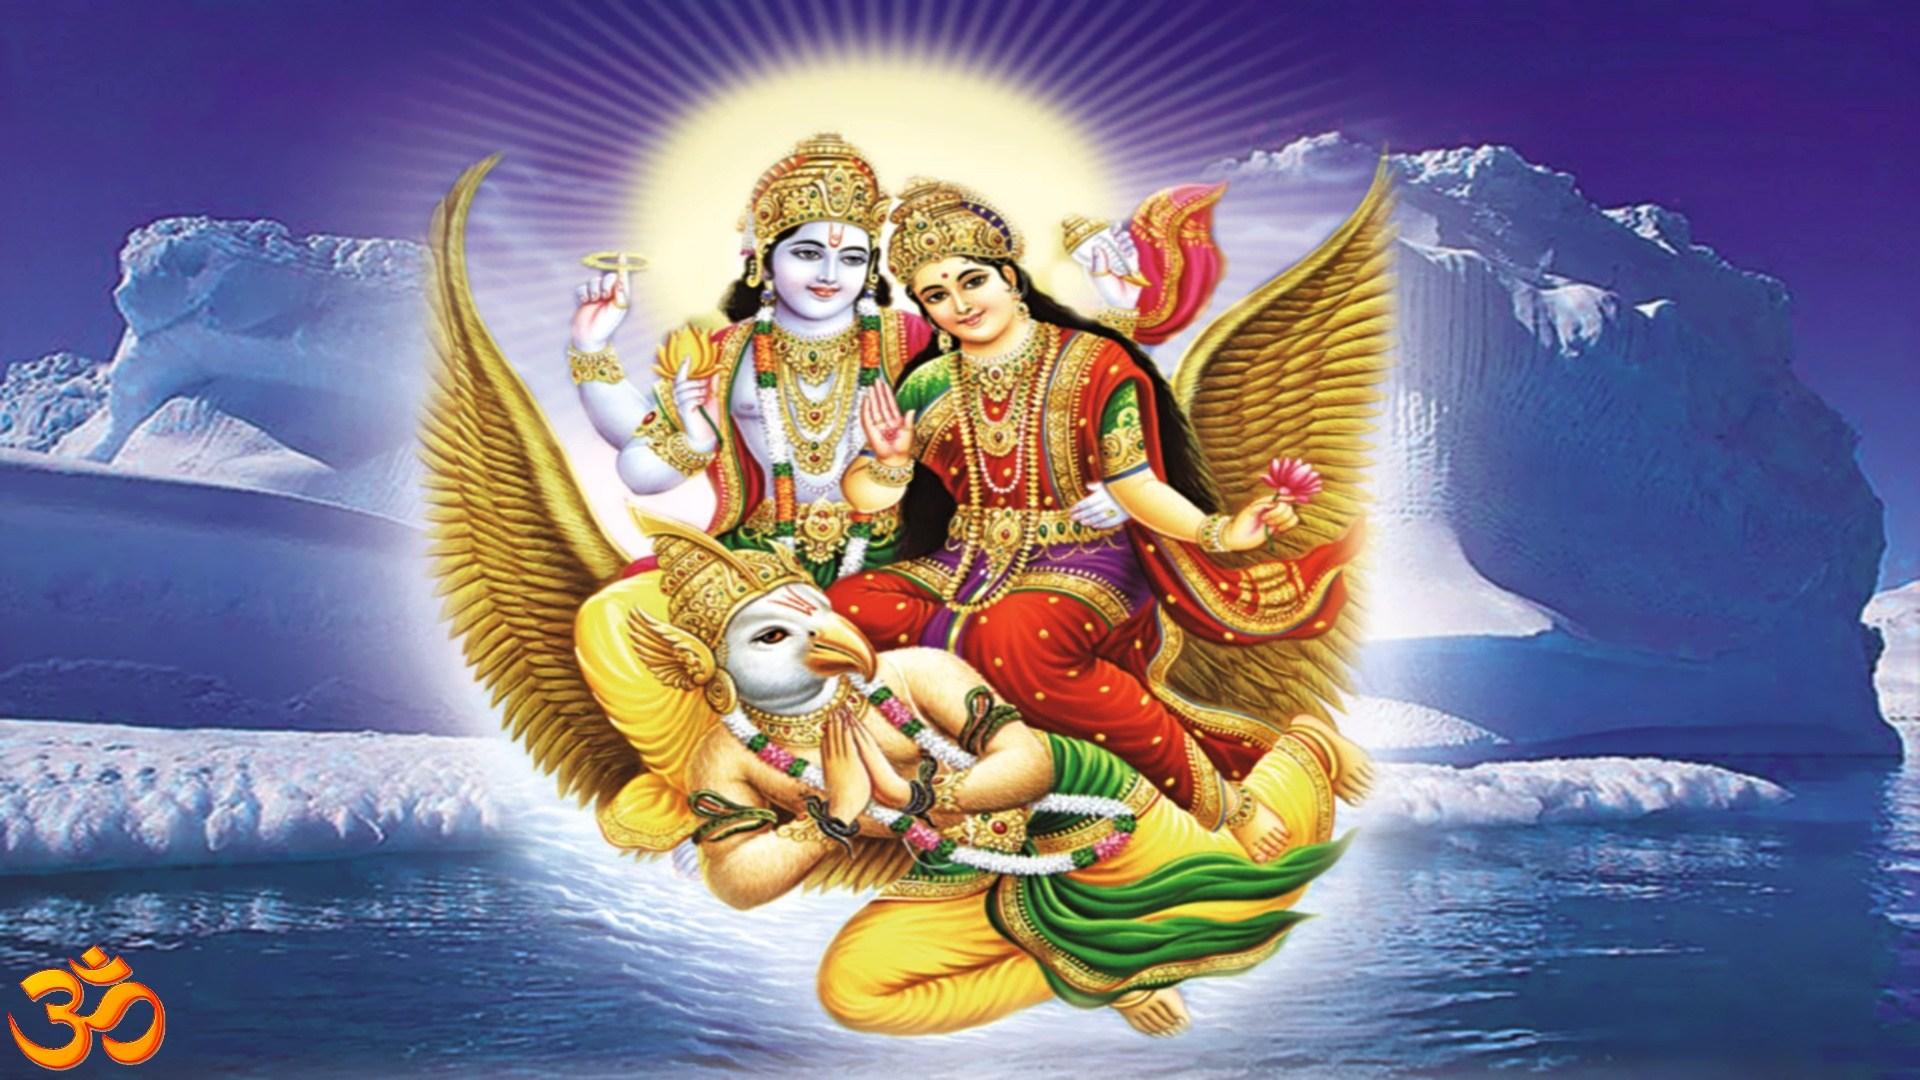 Image Of Lord Vishnu And Goddess Lakshmi On Garuda